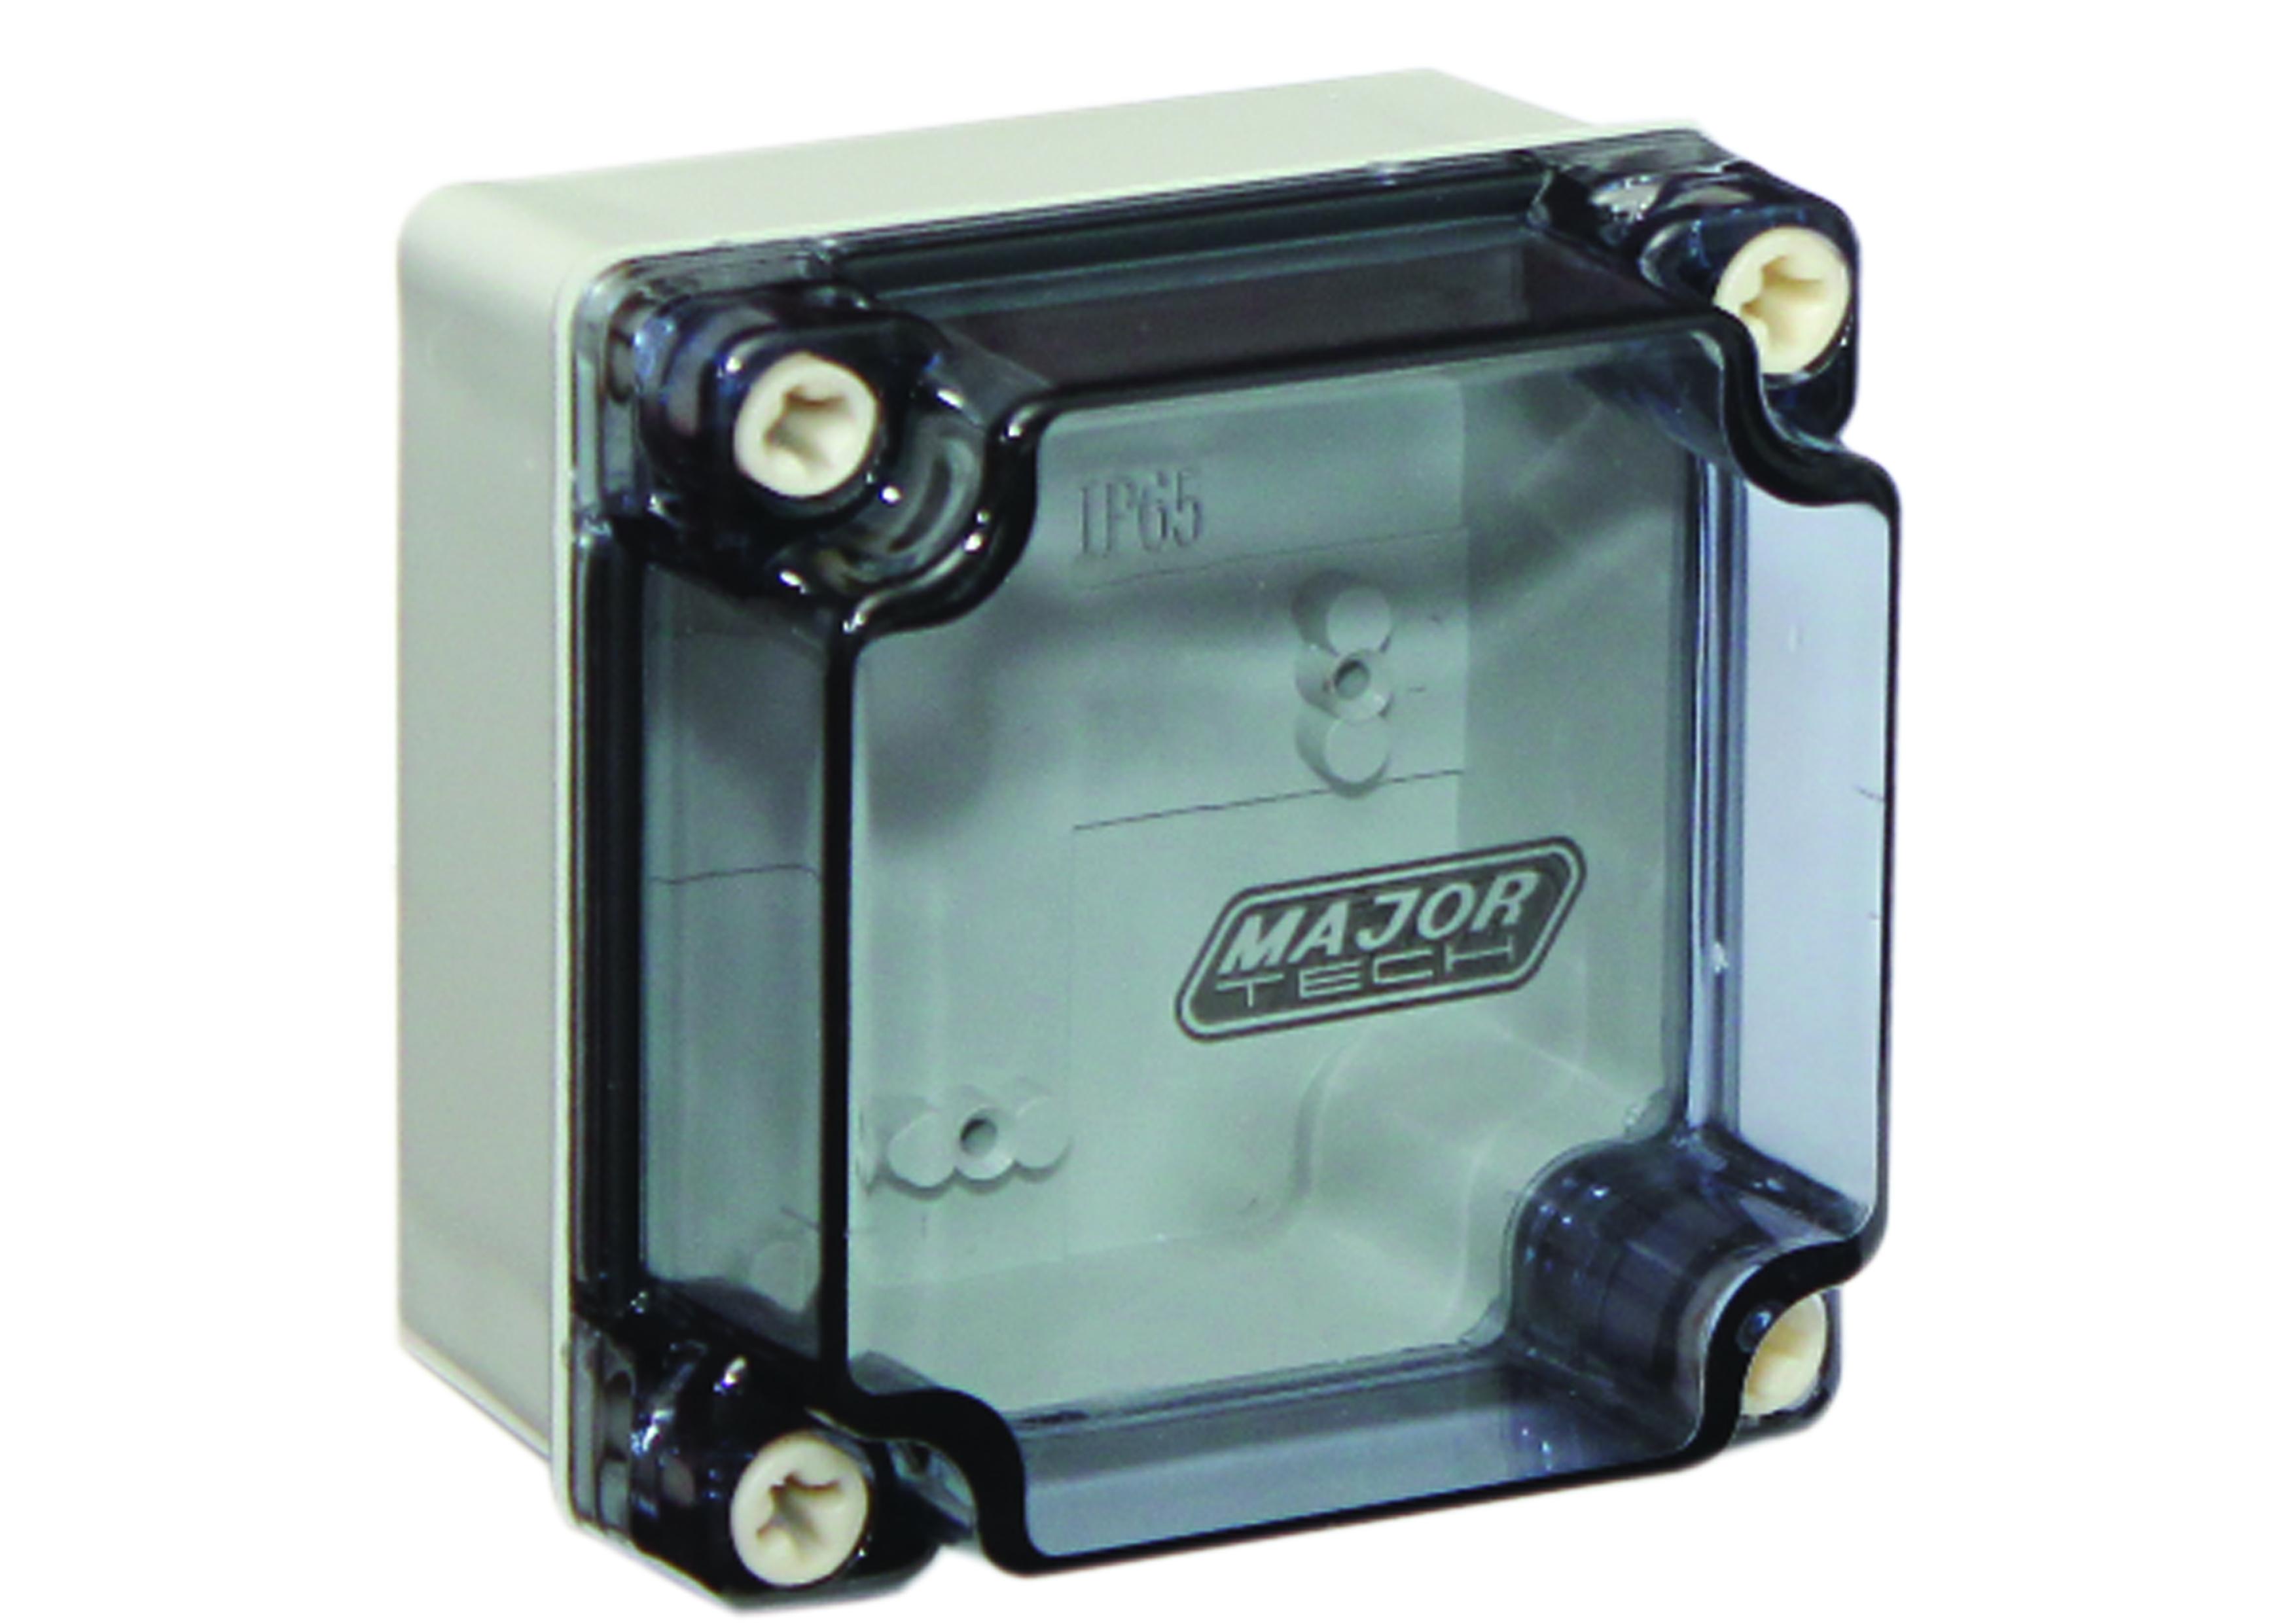 150mm x 150mm x 80mm Transparent IP65 Junction Box Pack of 2 (VW15158C) - VETi